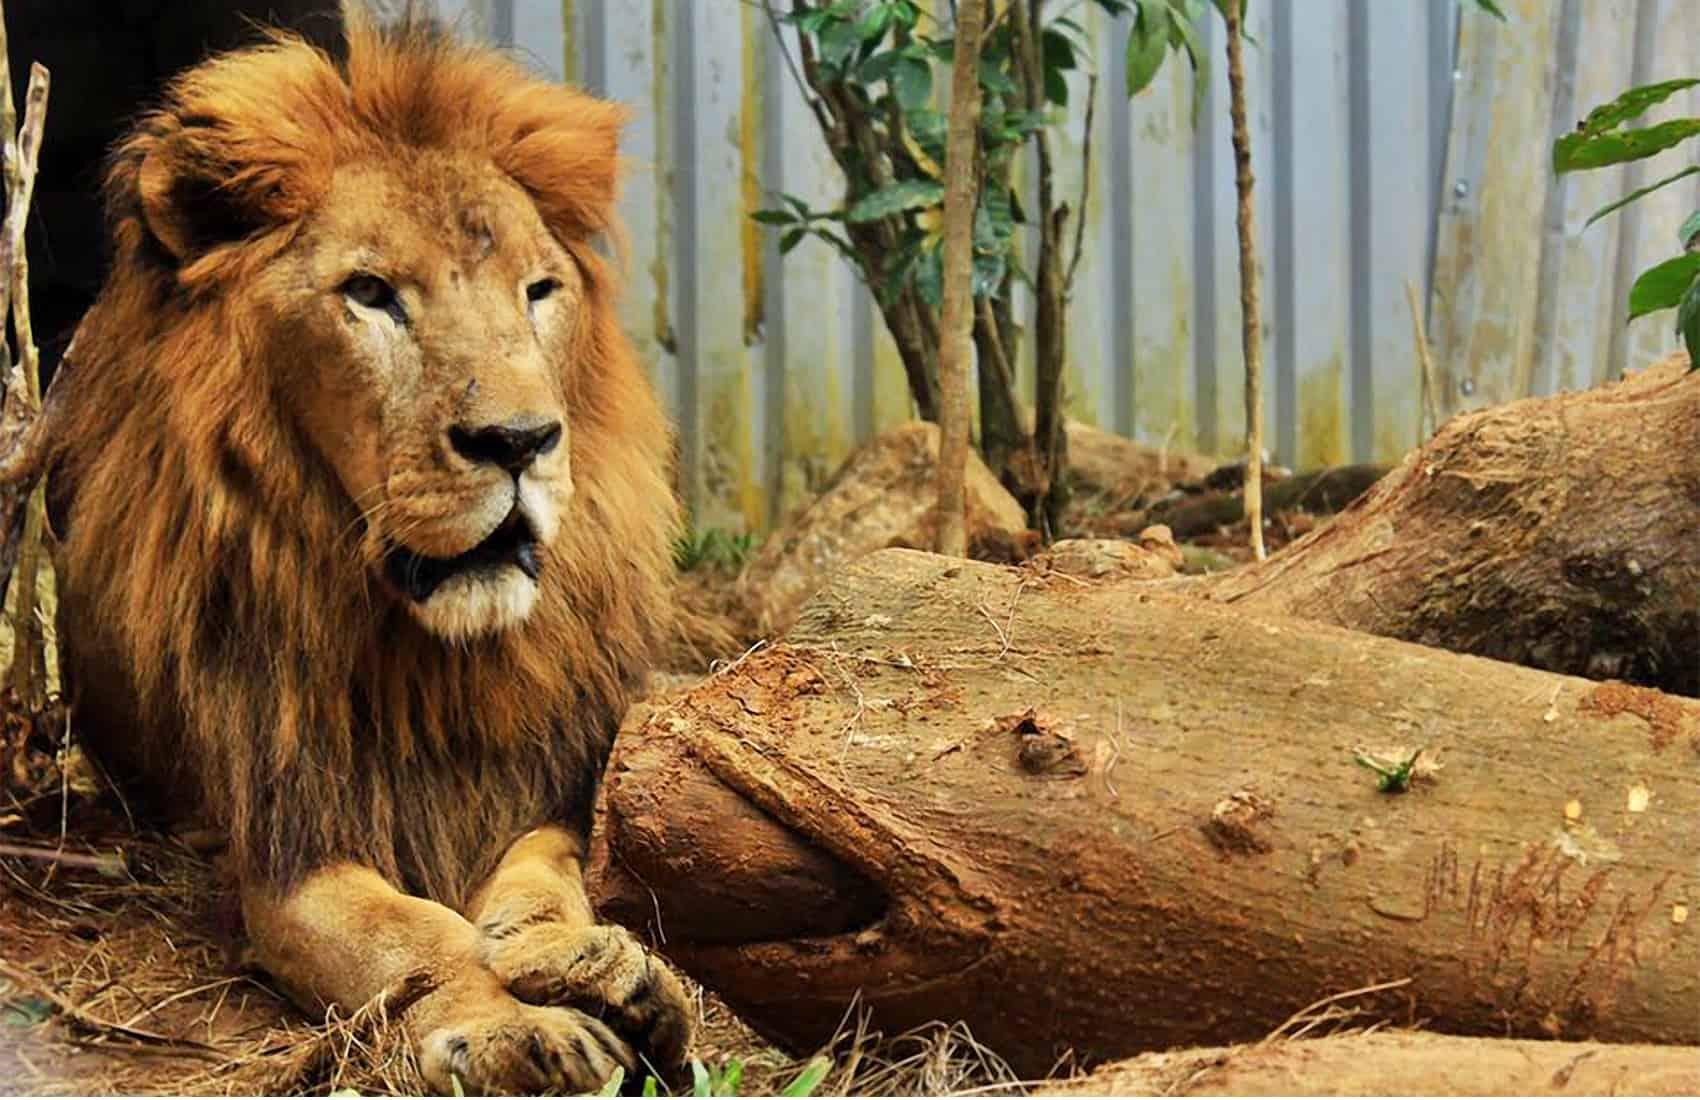 Kivú the lion. Feb. 2017.